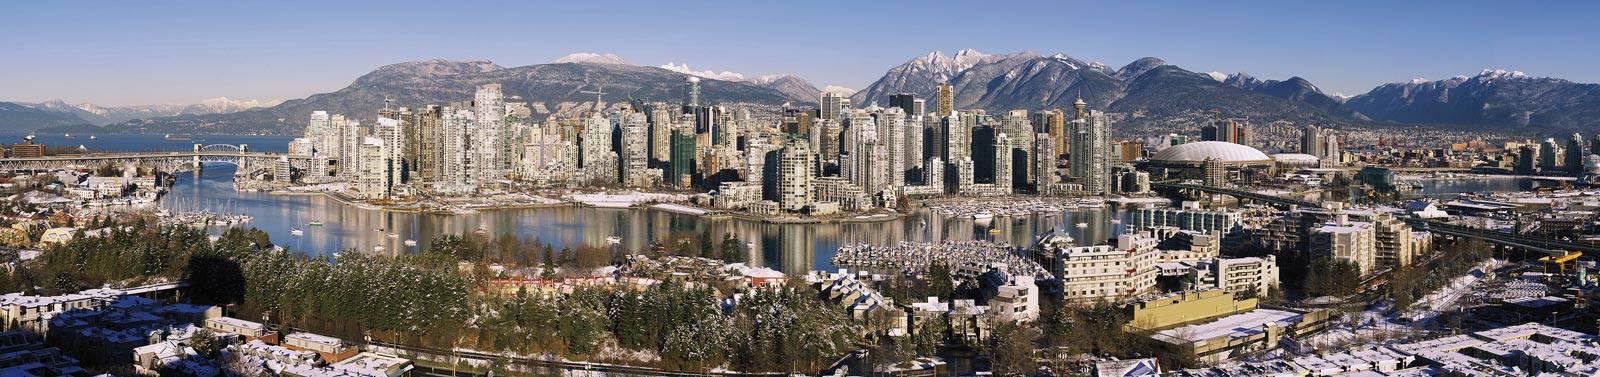 Estudiar de Inglés en Canadá para Adultos